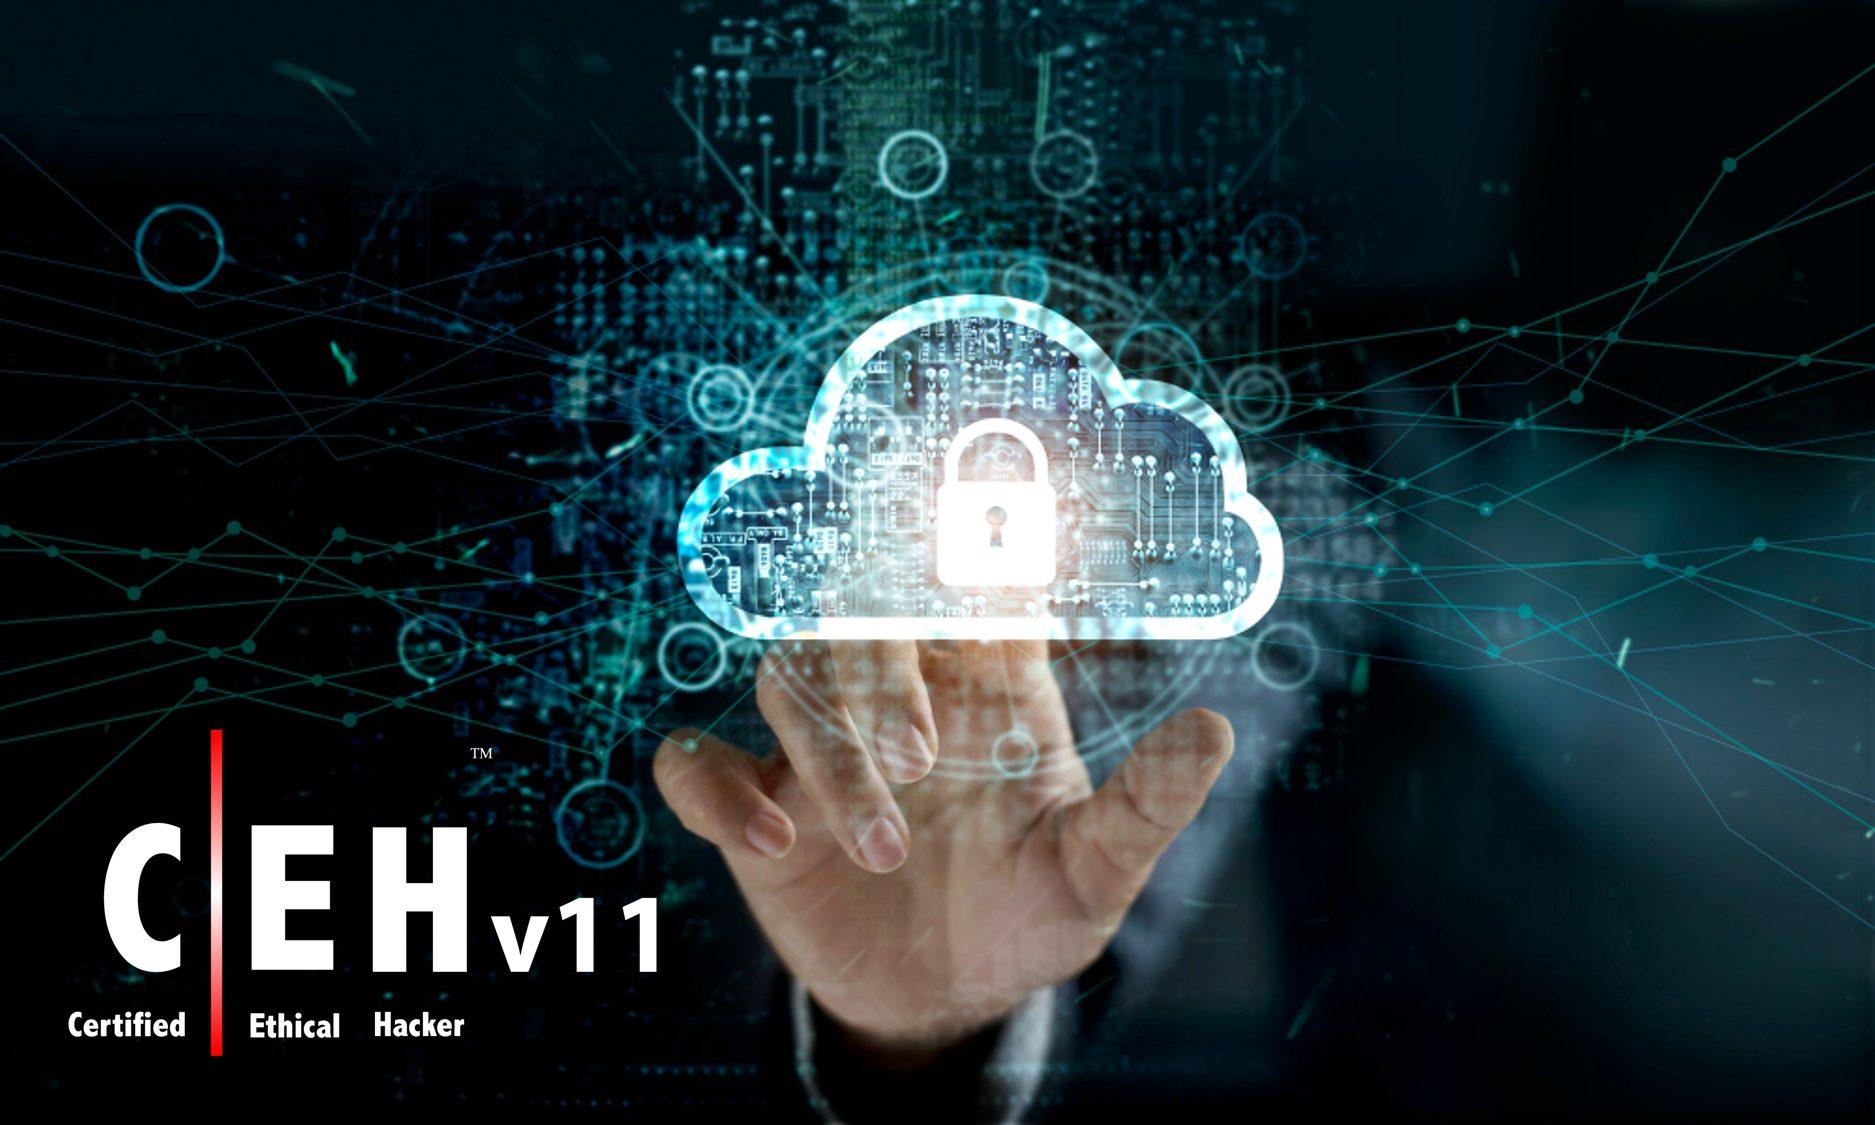 EC-Council – Certified Ethical Hacker (CEHv11)